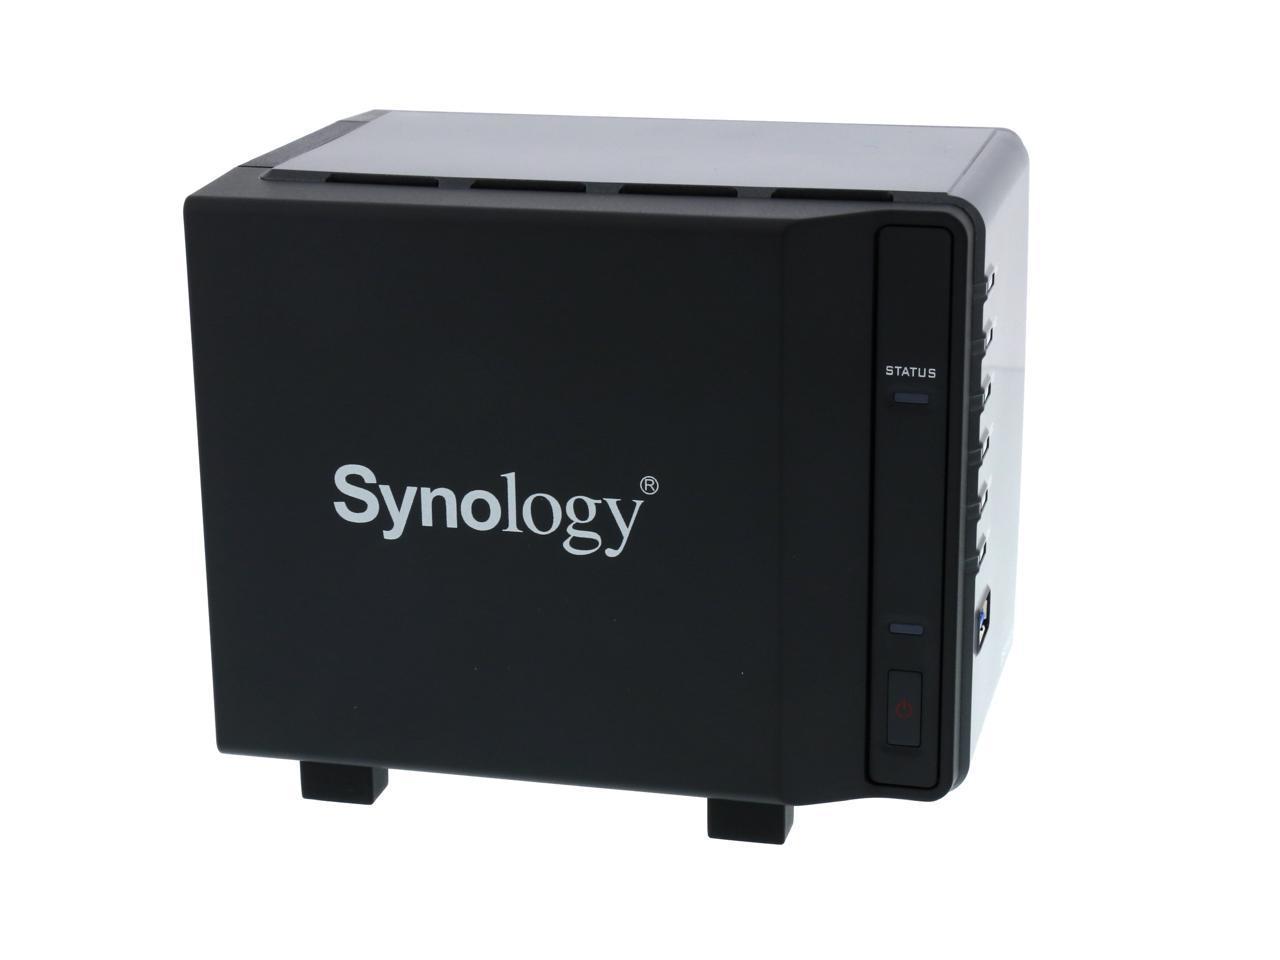 Open Box Synology 4 Bay Nas Diskstation Ds416slim Diskless Newegg Com